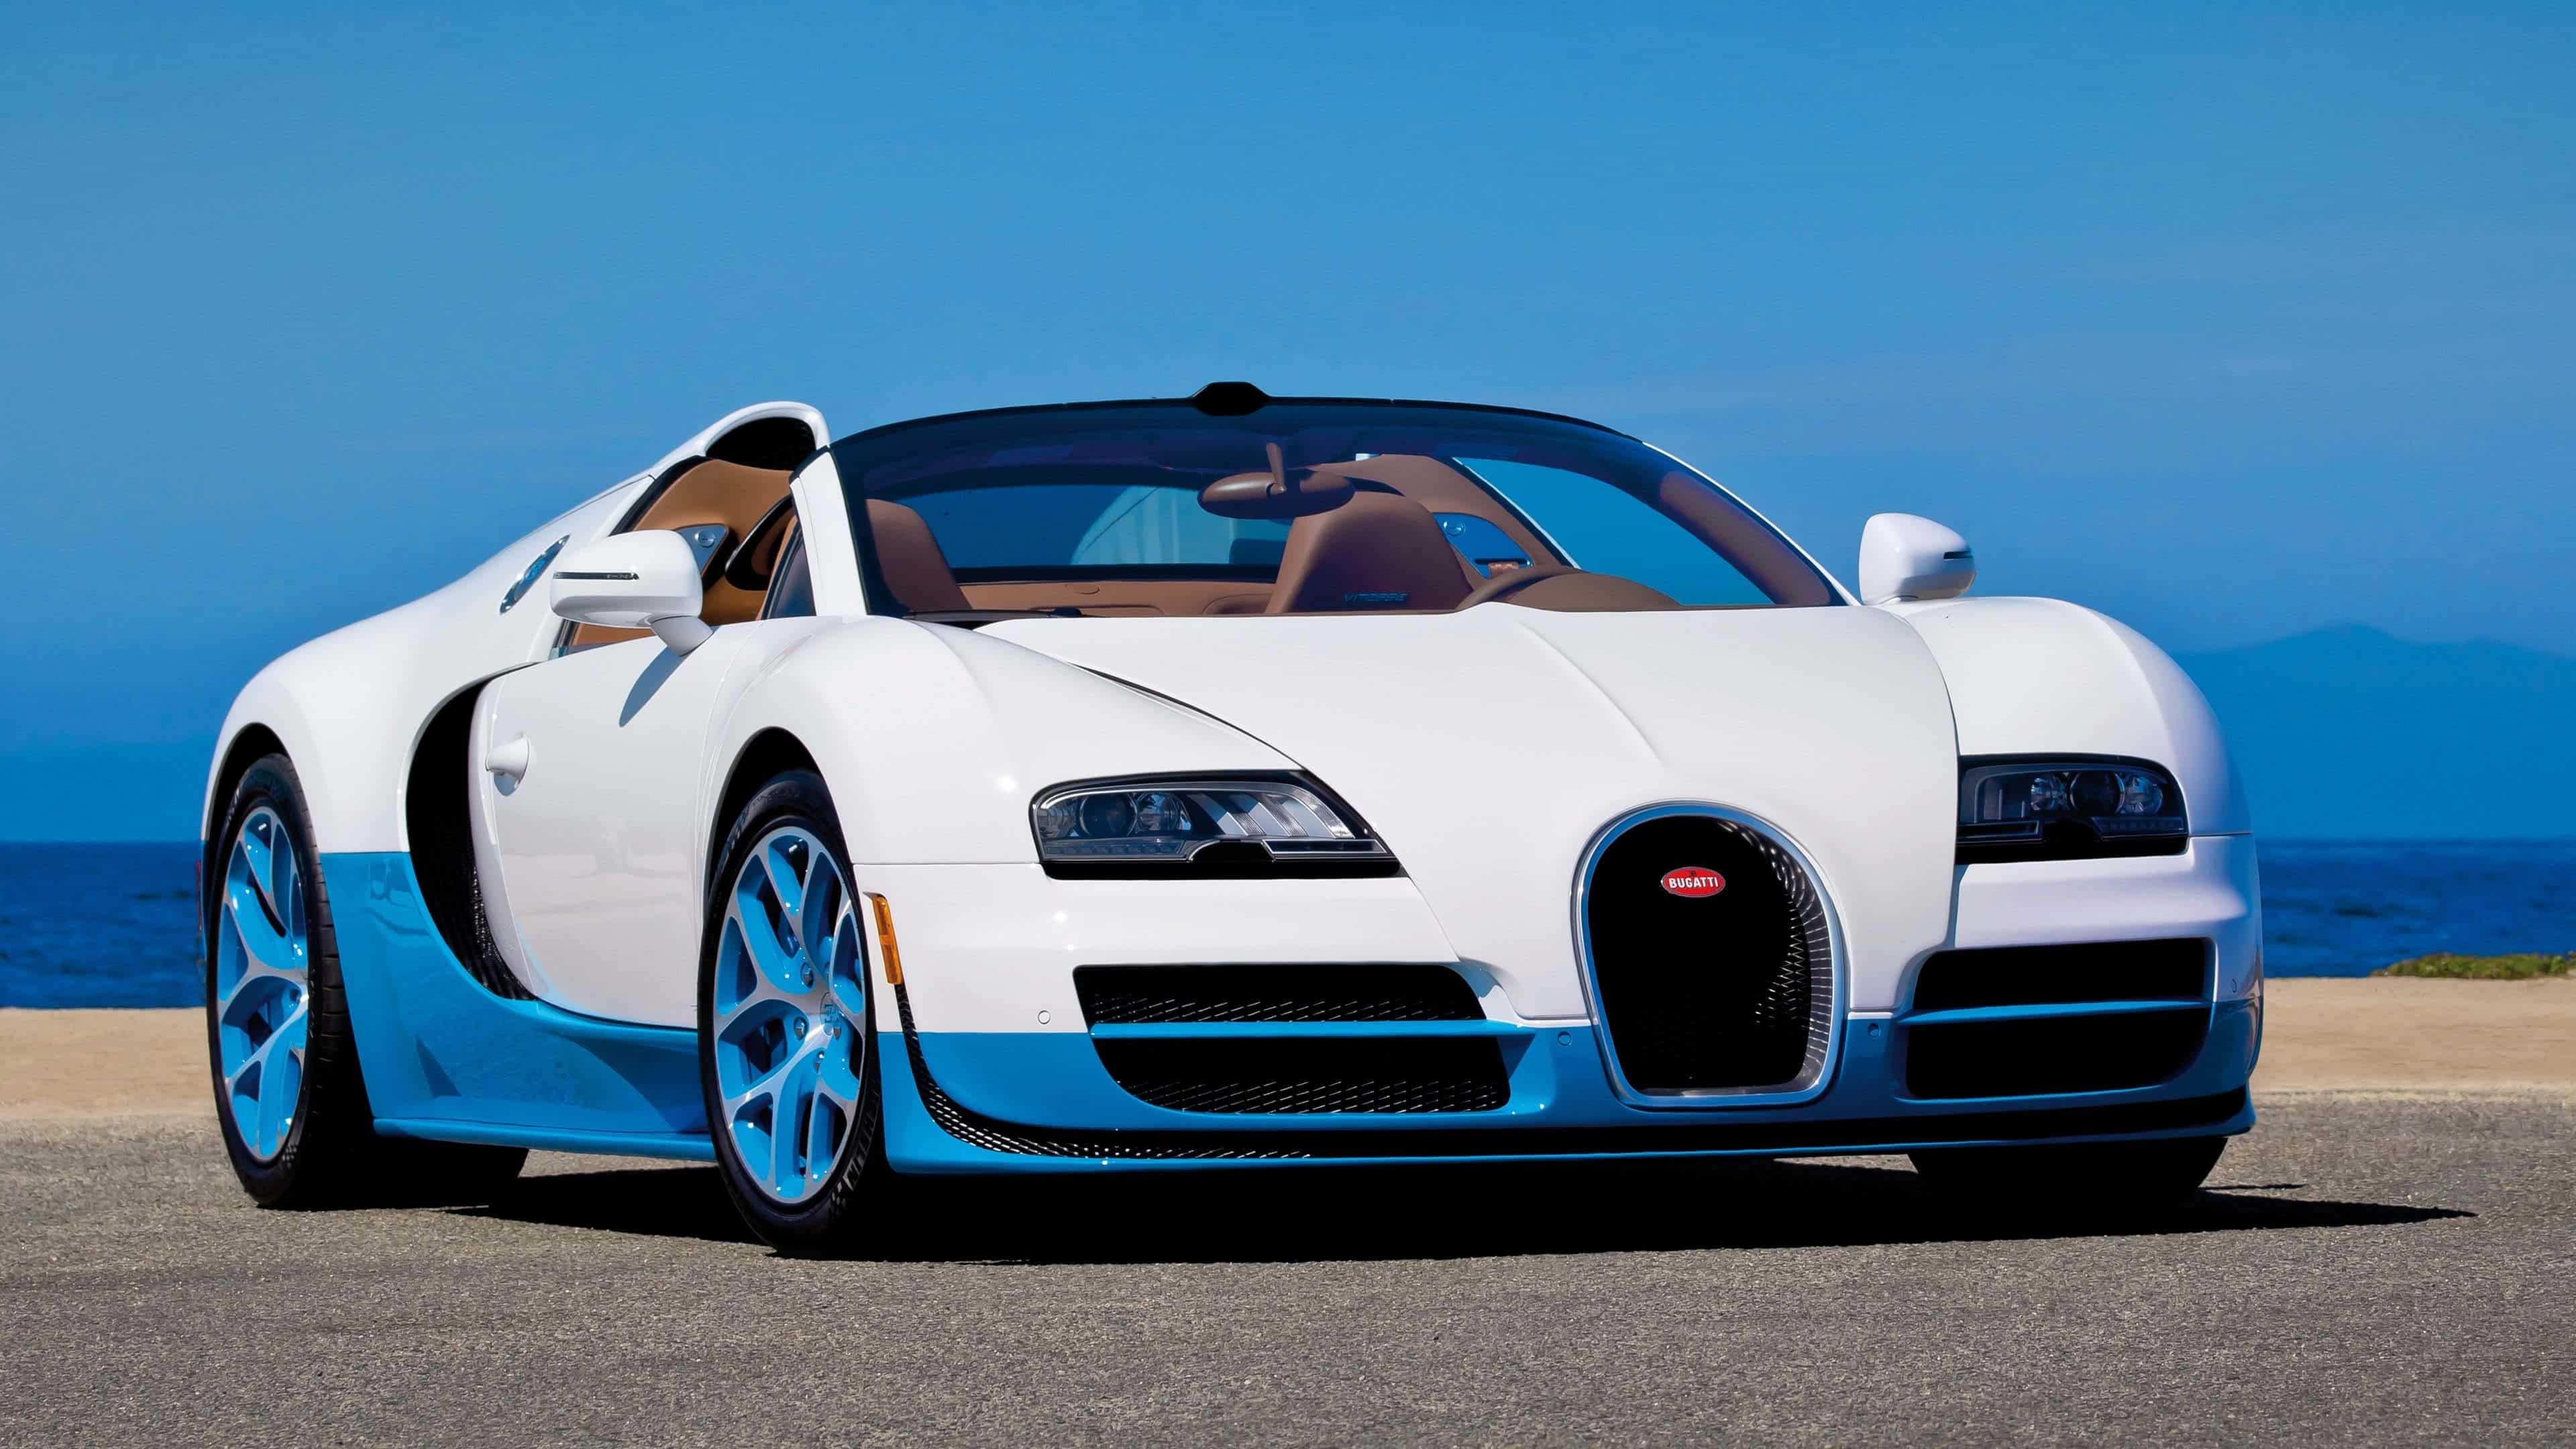 Bugatti Veyron Grand Sport Vitesse Uhd 4k Wallpaper Pixelz